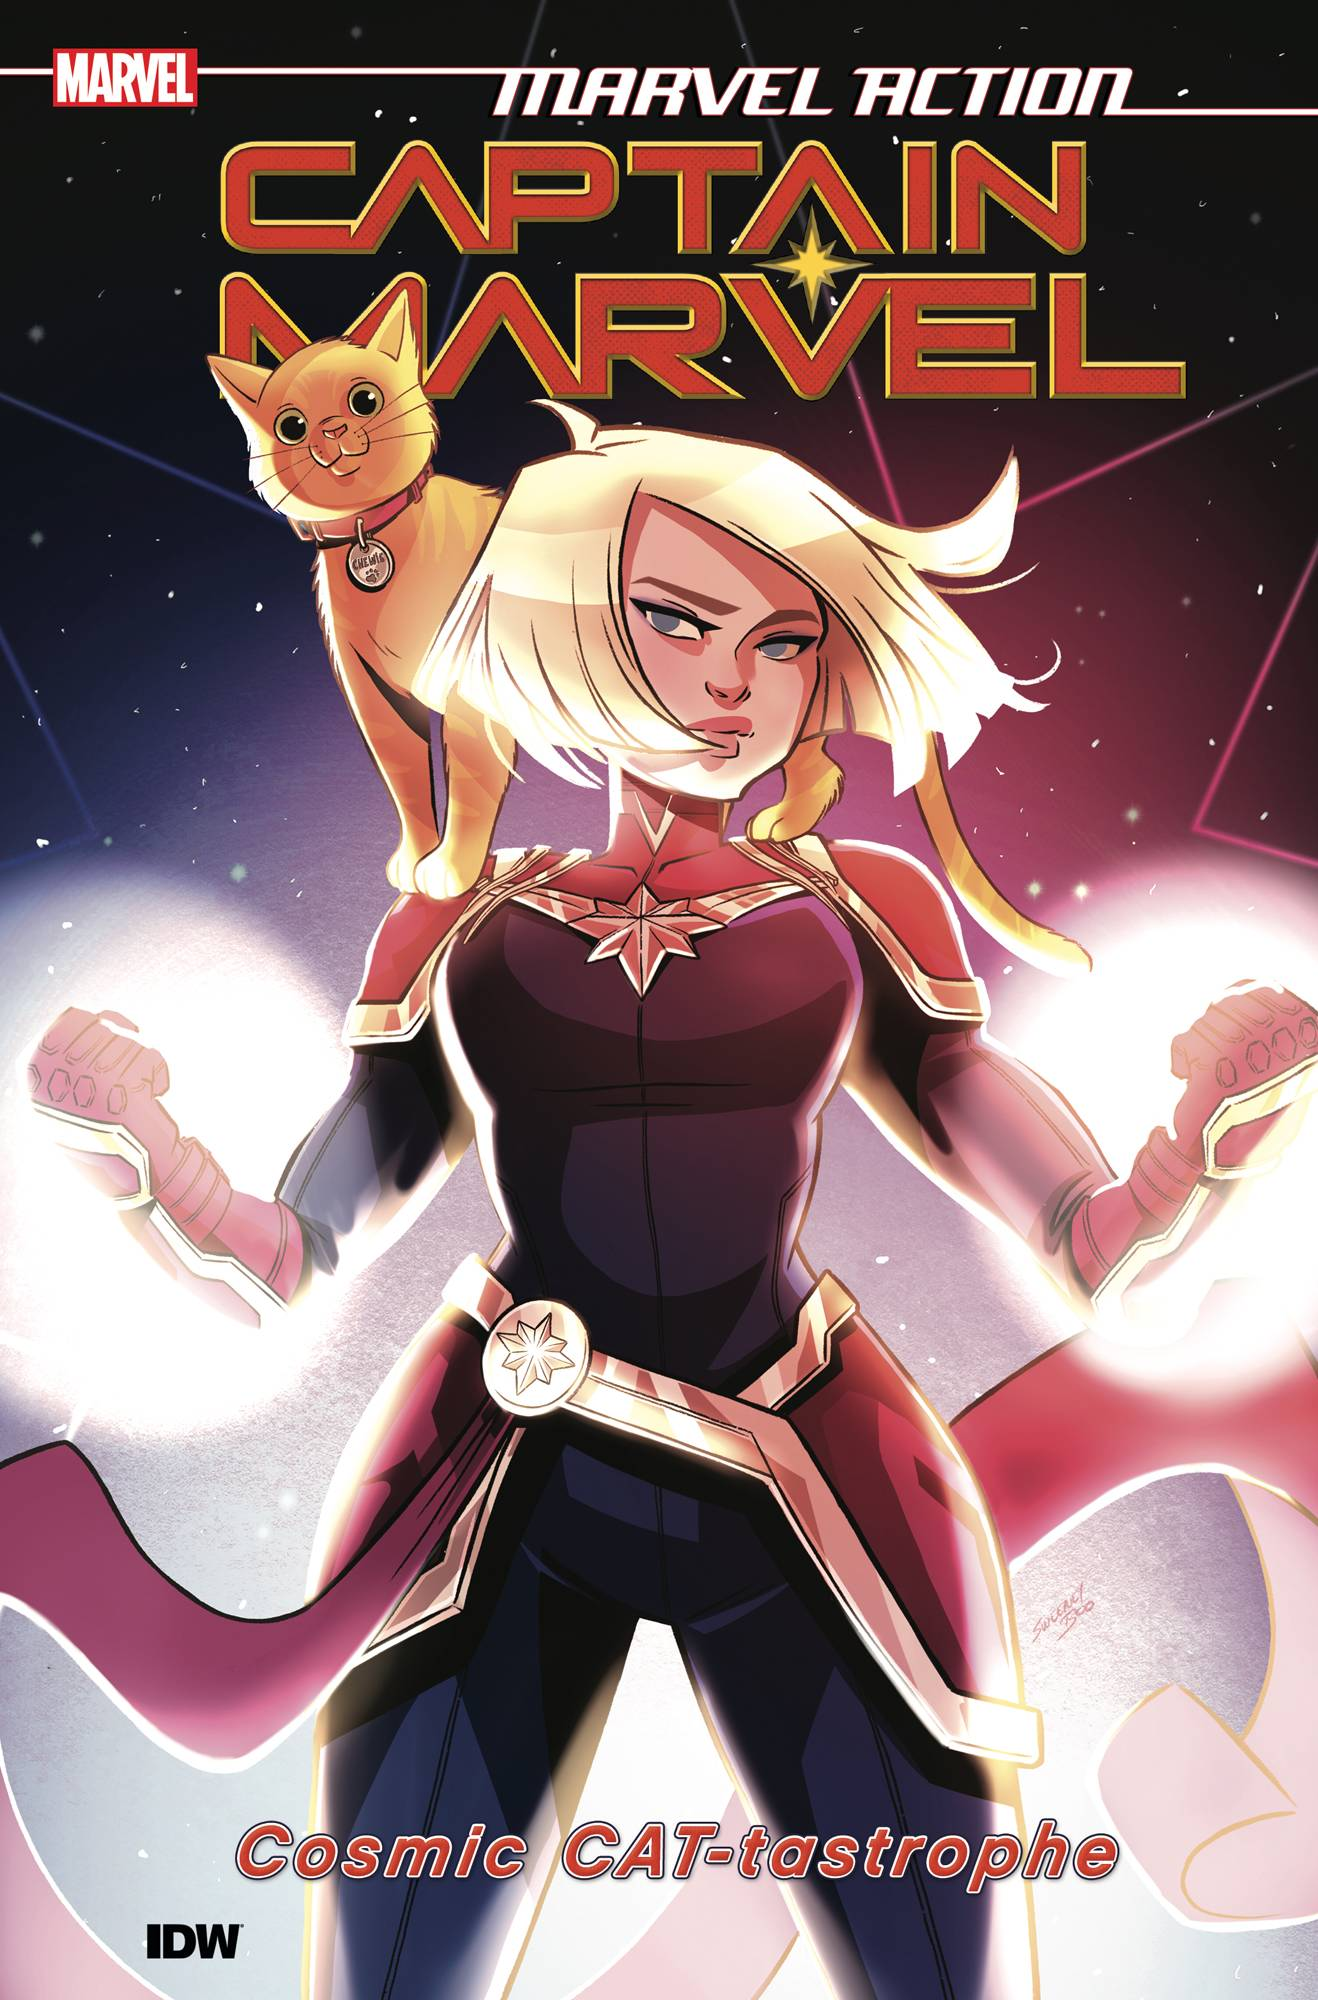 Marvel Action Captain Marvel TP Vol. 1 Cat-tastrophe